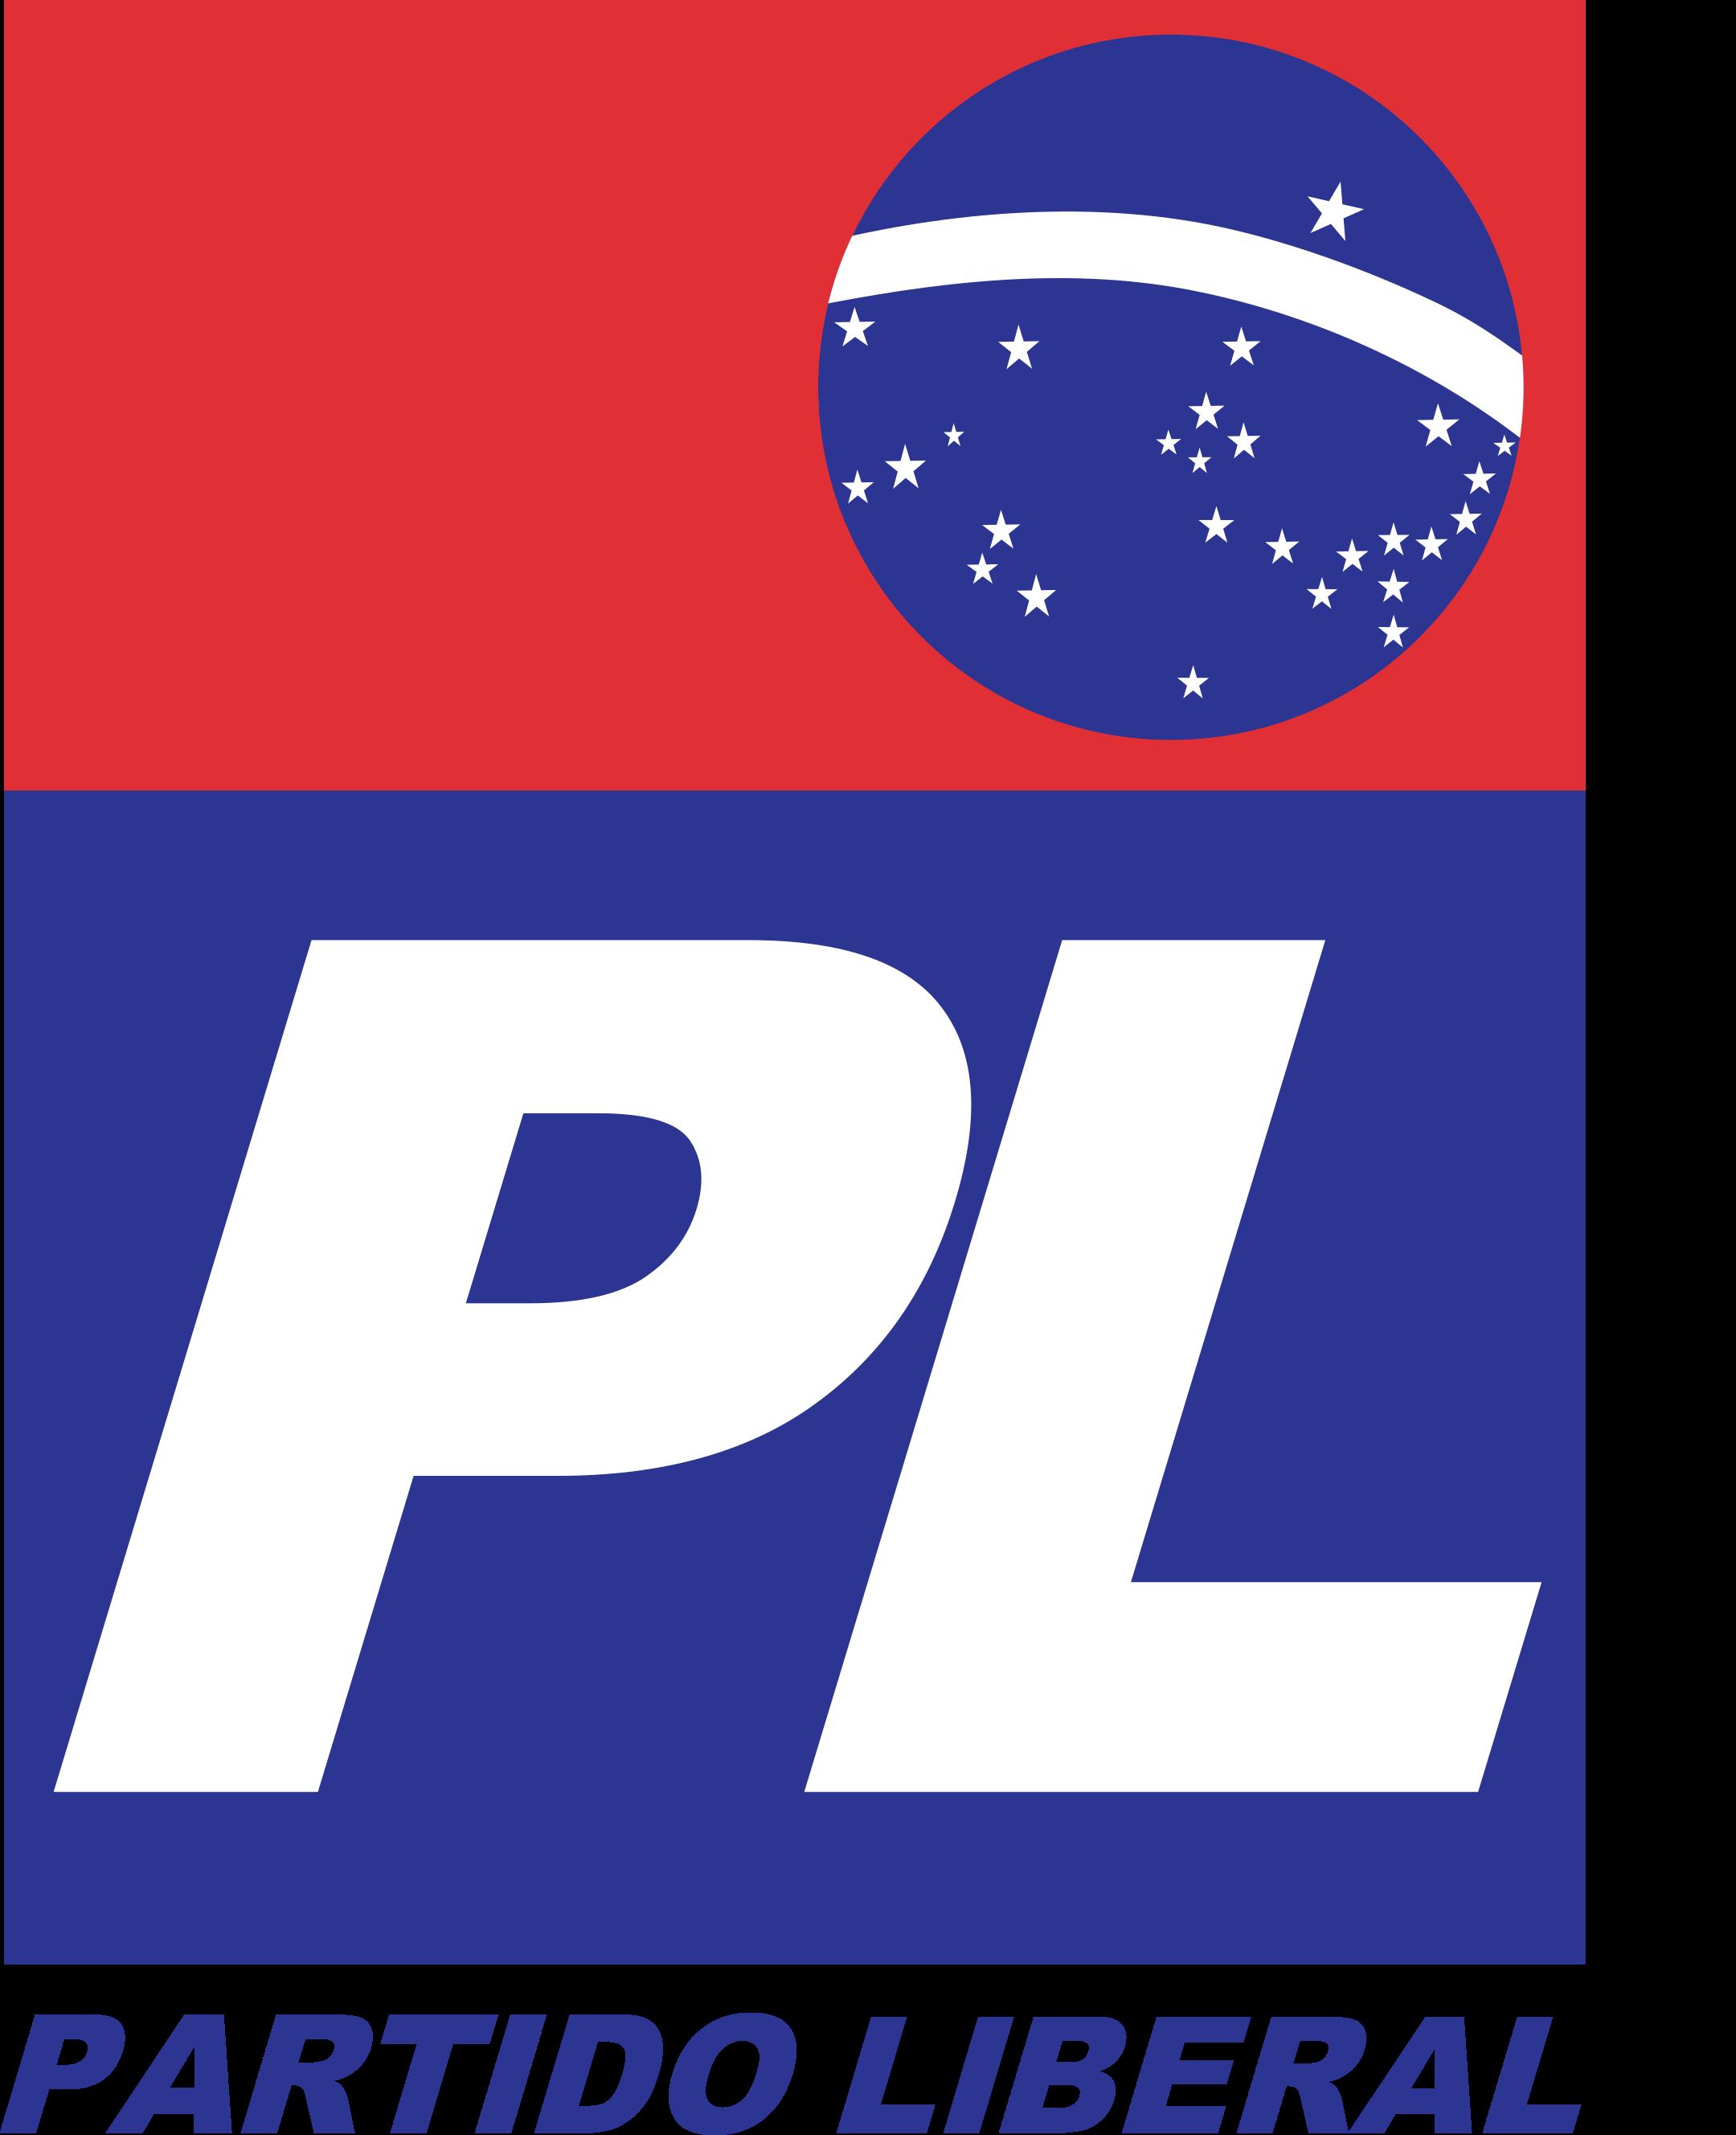 pl partido liberal logo 1 - PL Partido Liberal Logo